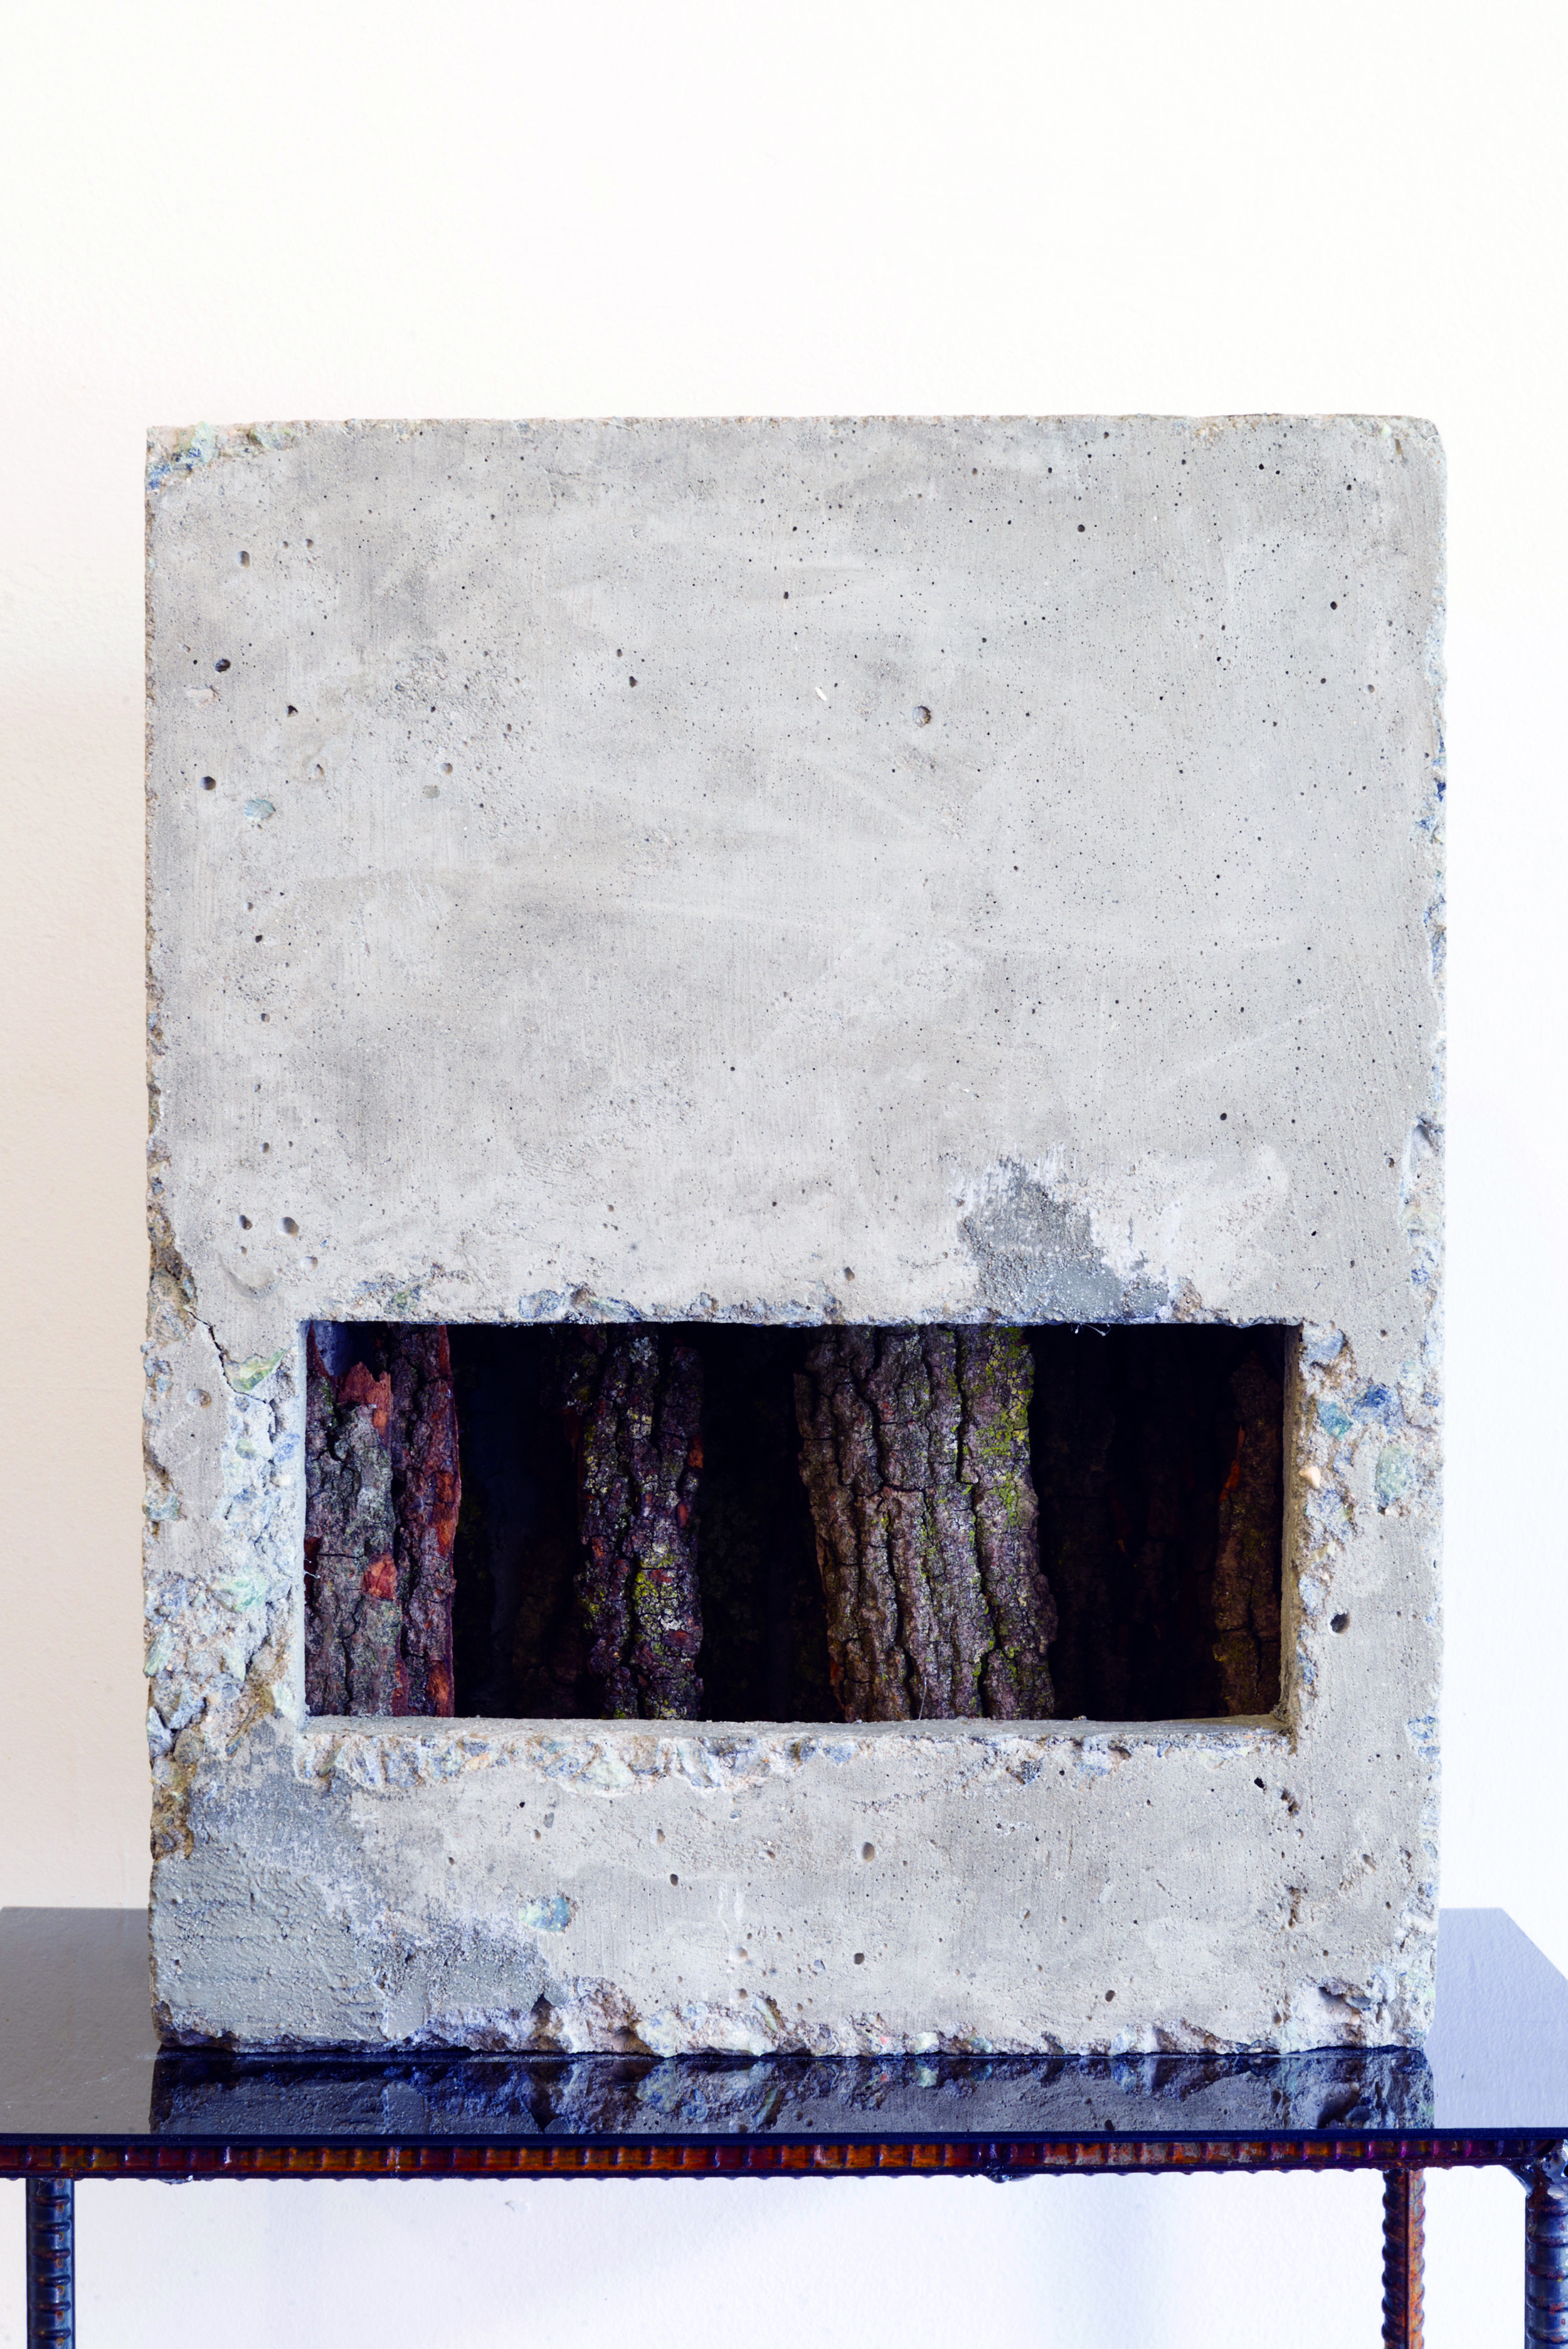 Noa Heyne,  Reenter the Night,  2015. Concrete, tree bark, rebar, and Plexiglass (1 of 3). Dimensions variable.